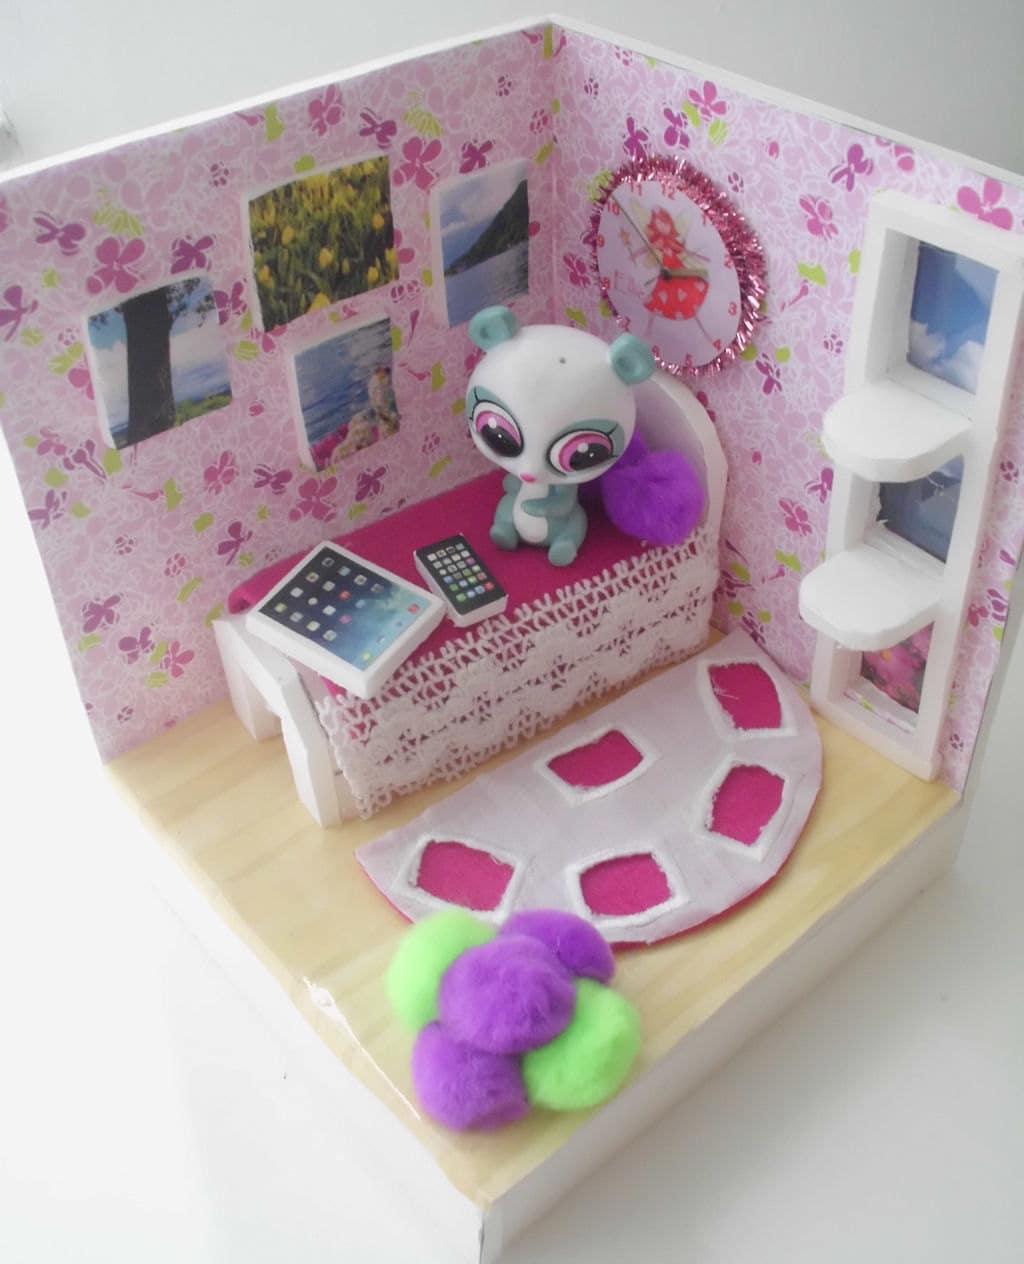 littlest pet shop lps play set bedroom handmade